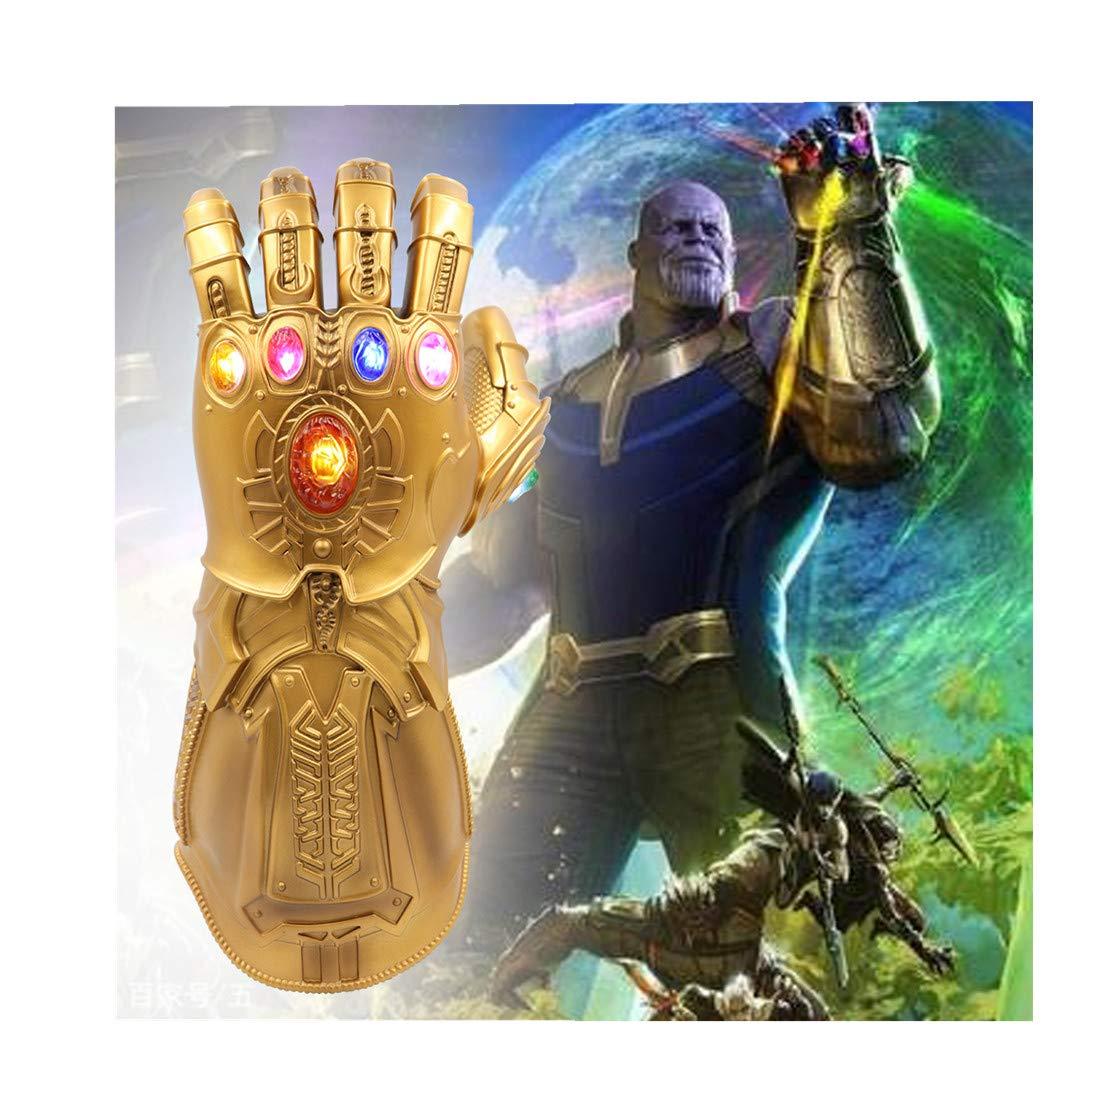 Infinity Gauntlet LED Light PVC Gloves Gift Toy for Halloween Props for Kids (Gold)